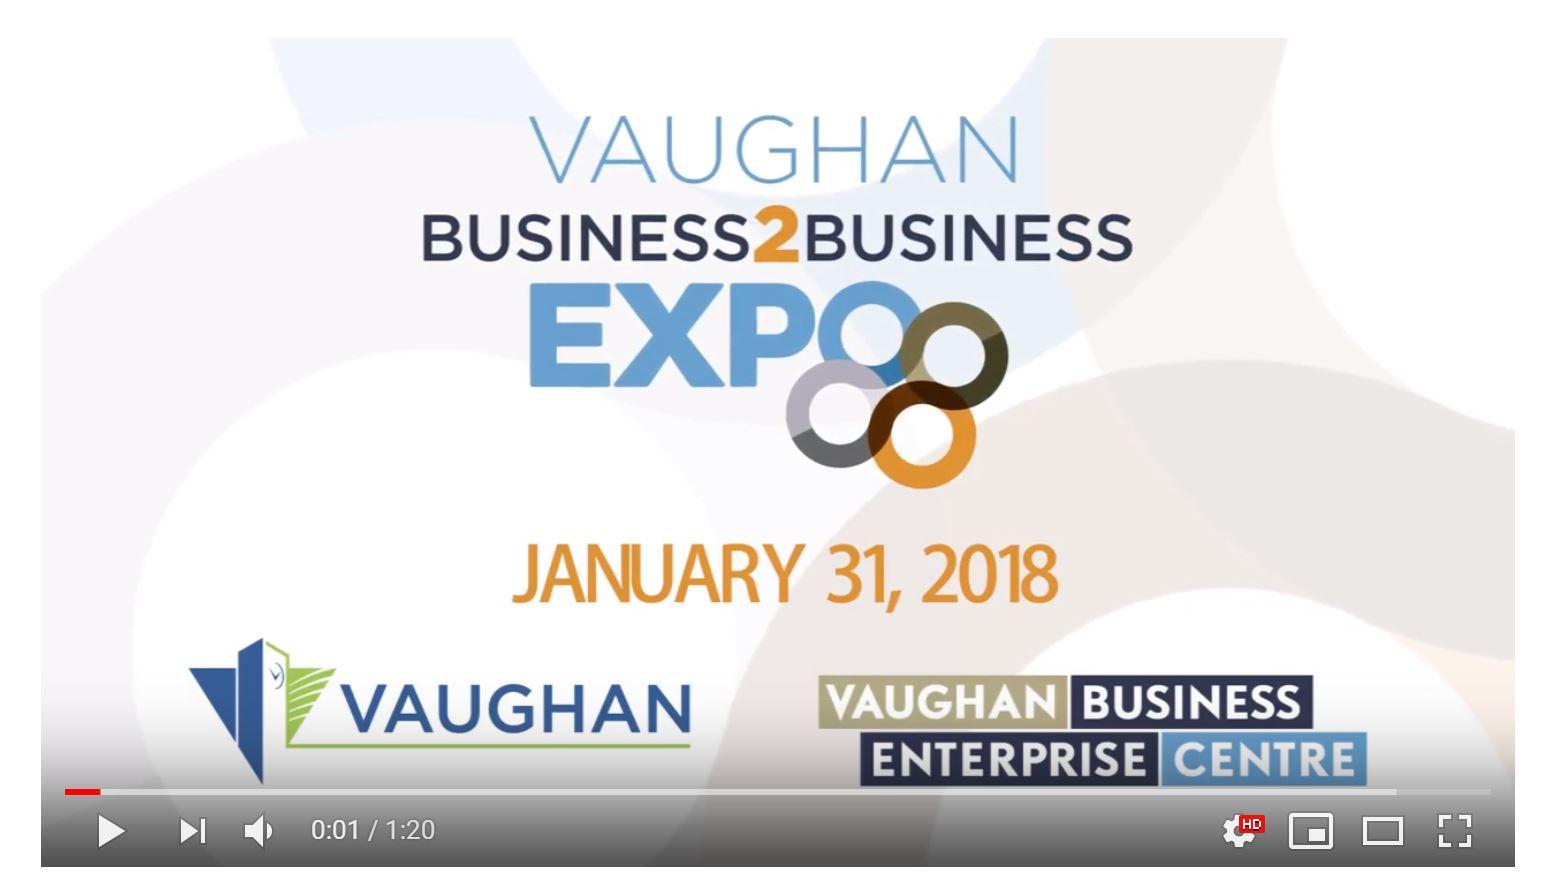 B2B Expo Video